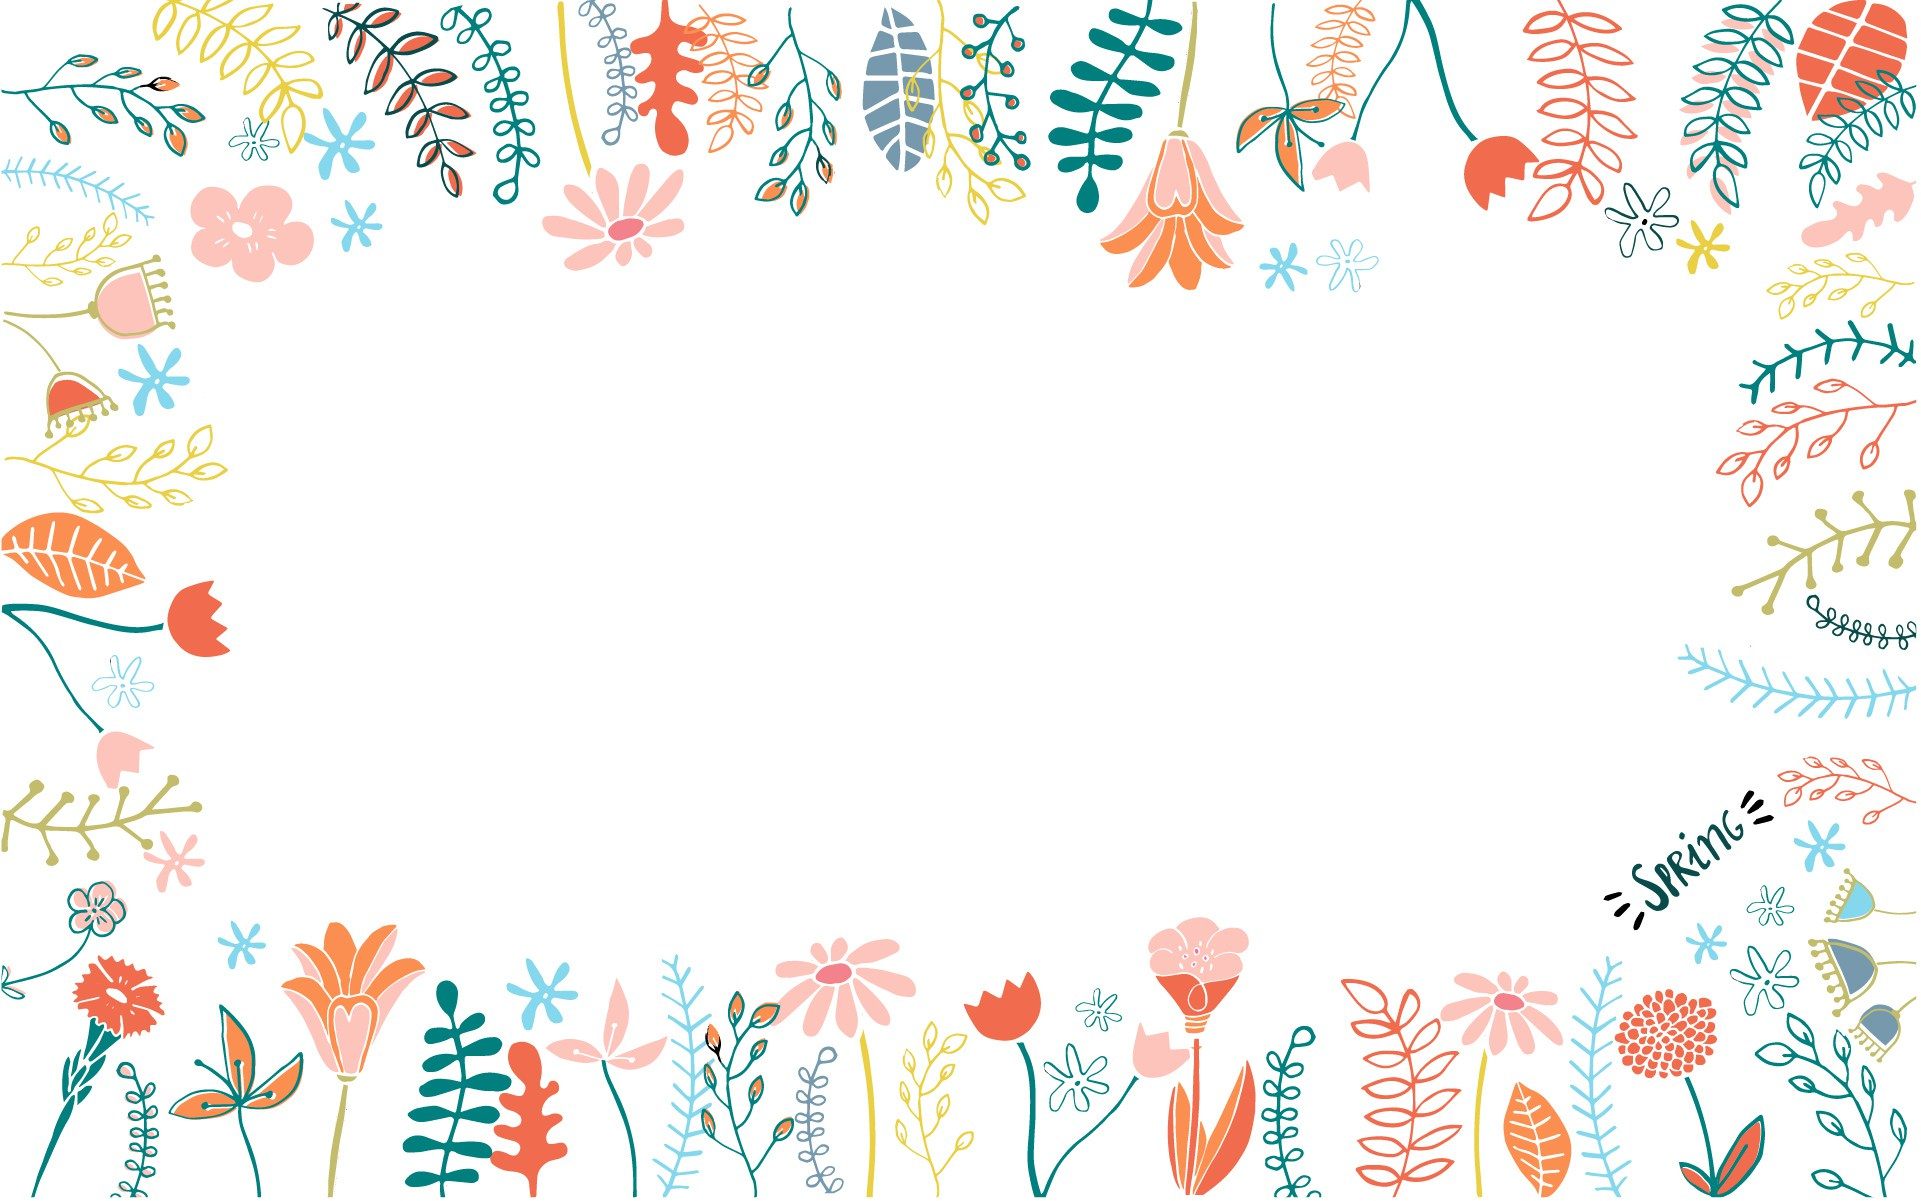 Free Desktop Wallpaper Watercolor Floral Desktop 150207 Hd Wallpaper Backgrounds Download